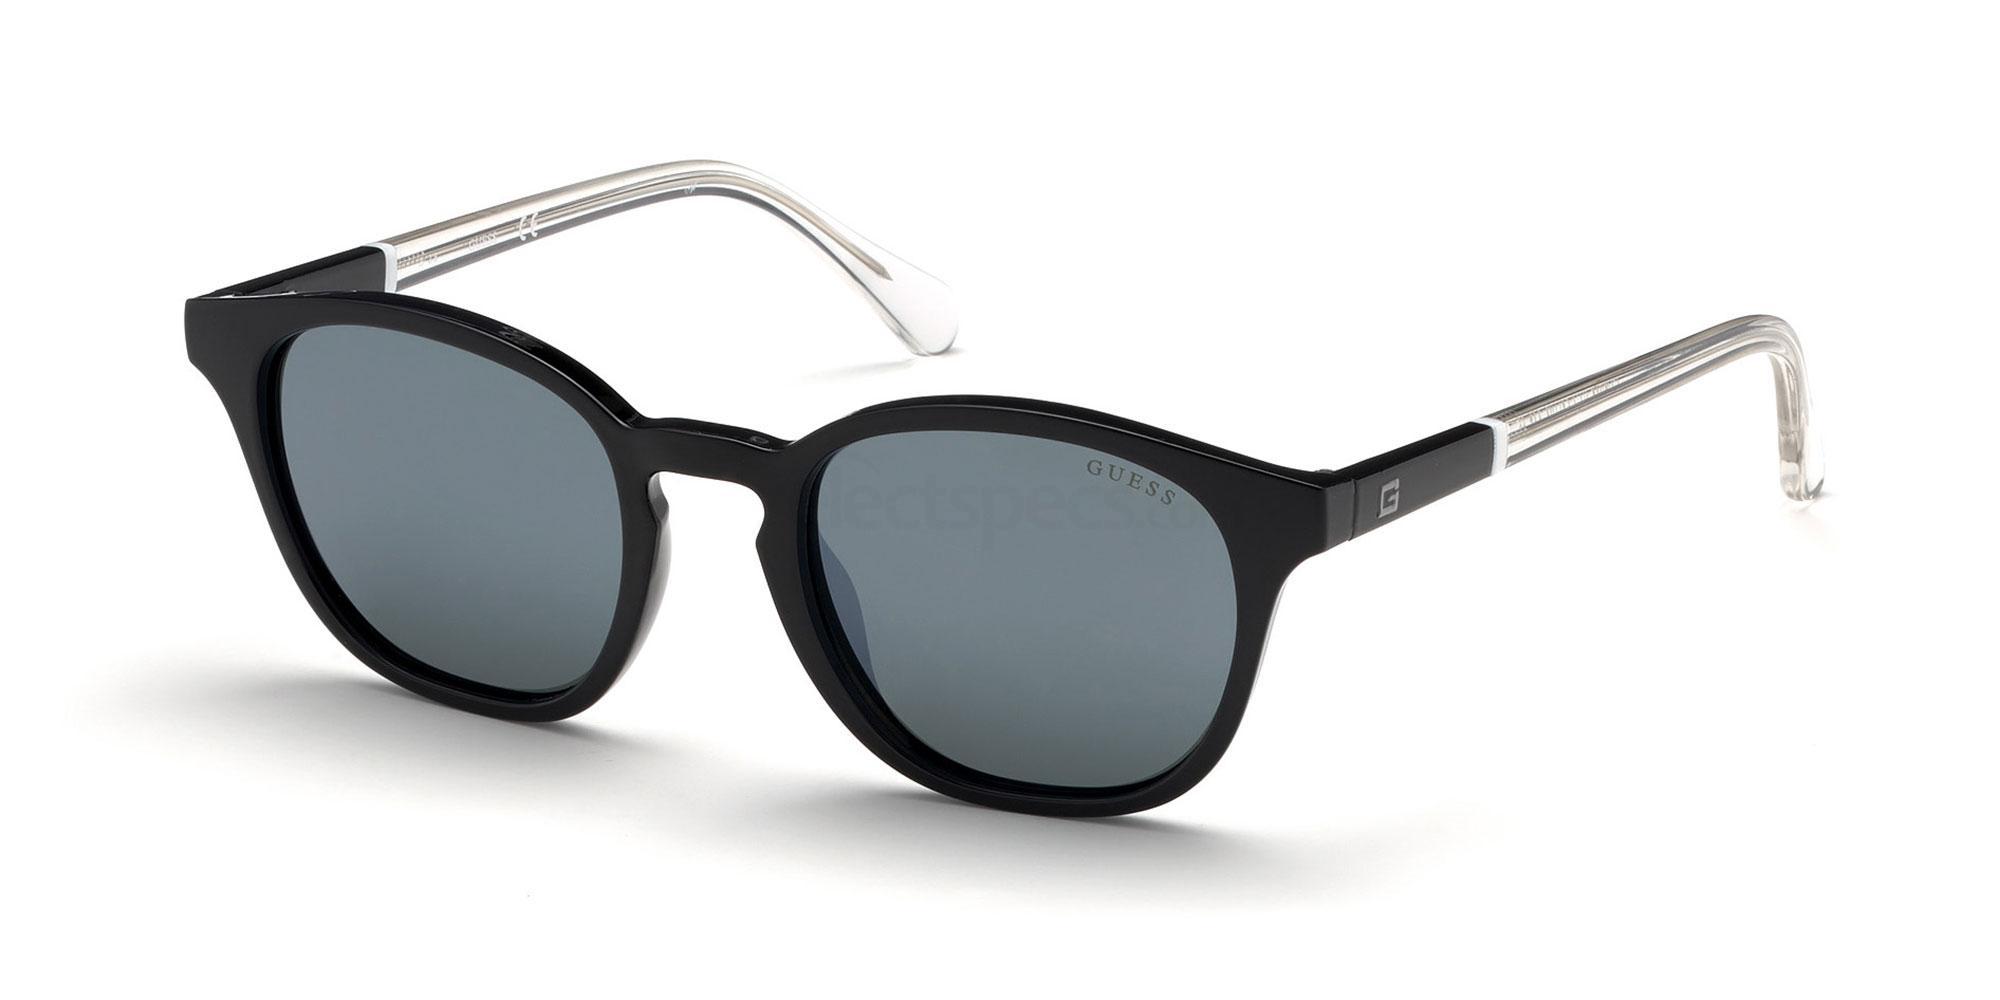 01Q GU6945 Sunglasses, Guess